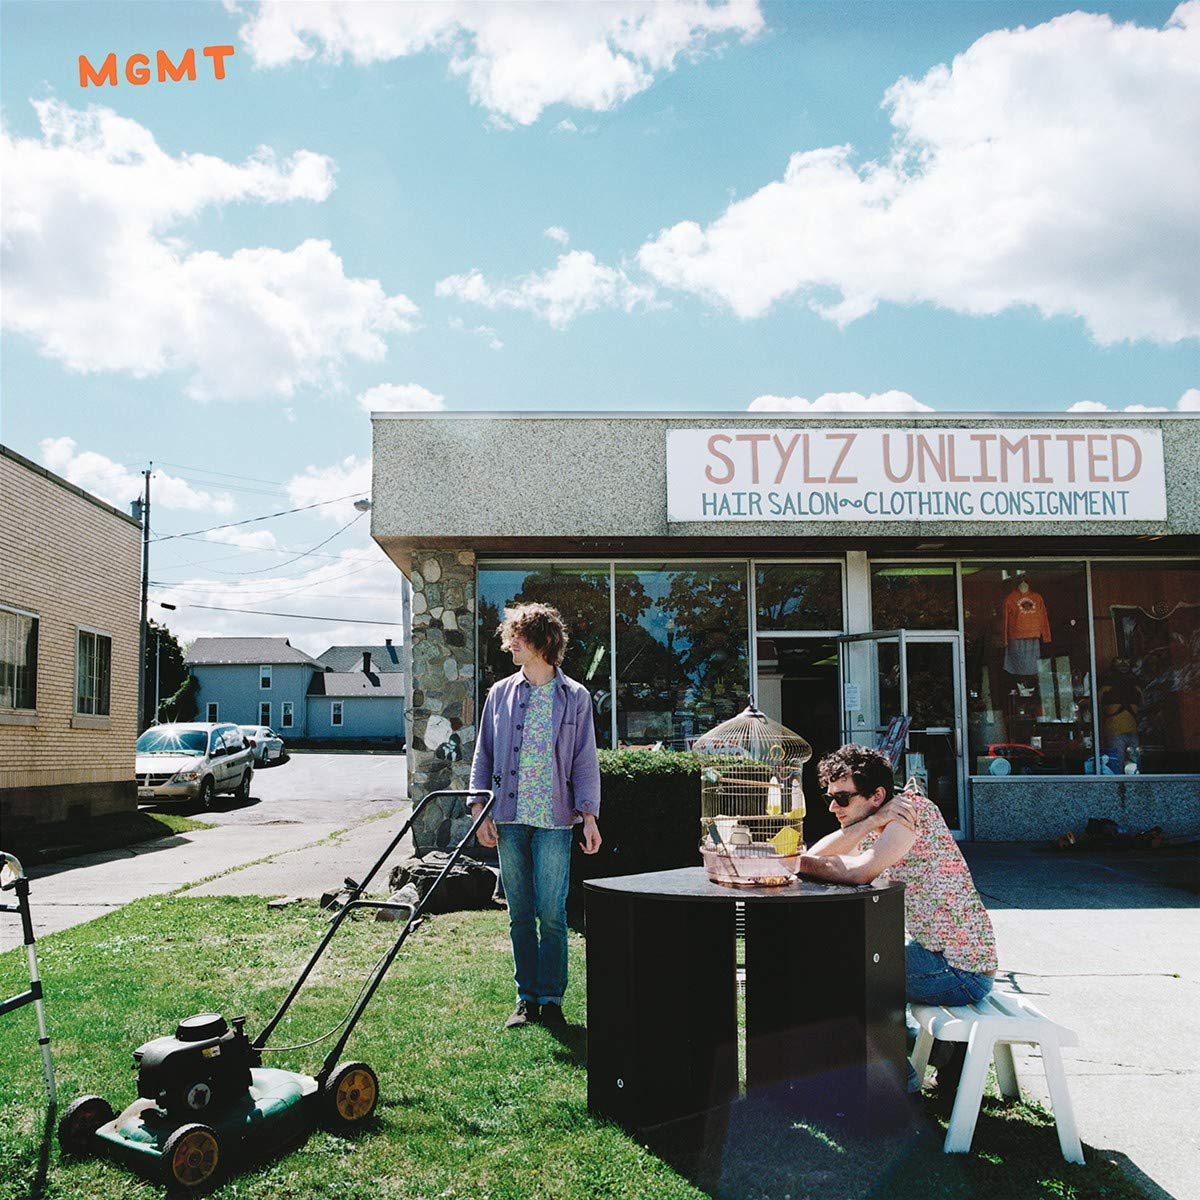 MGMT - MGMT - Amazon.com Music